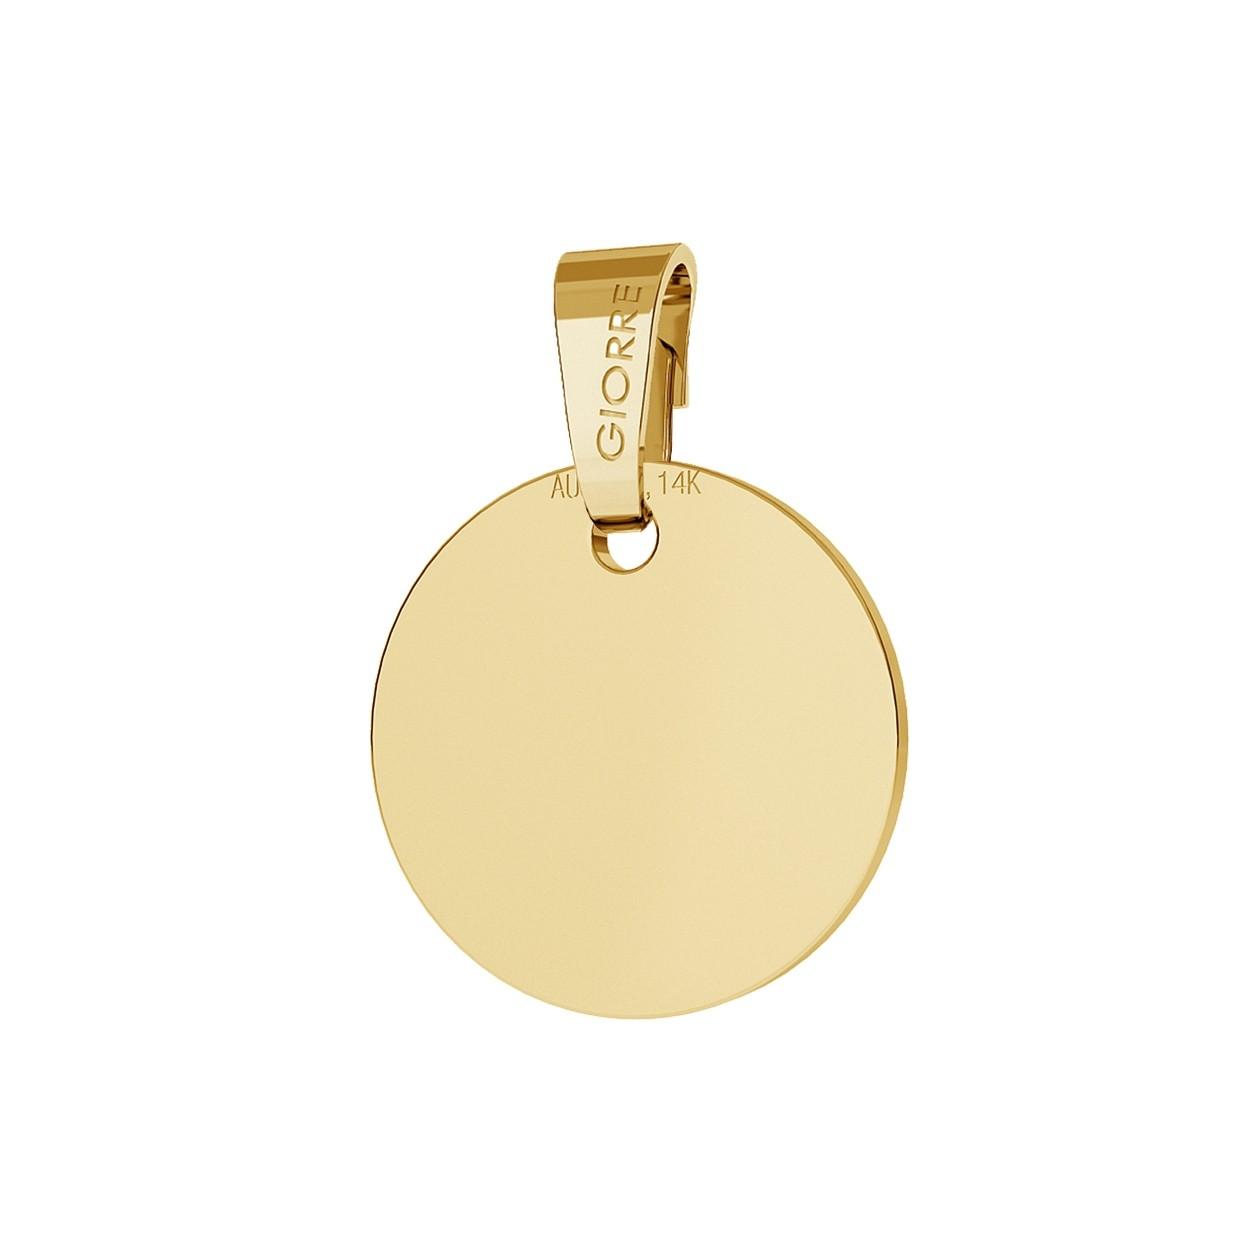 Oro redondo colgante grabado 585, giorre